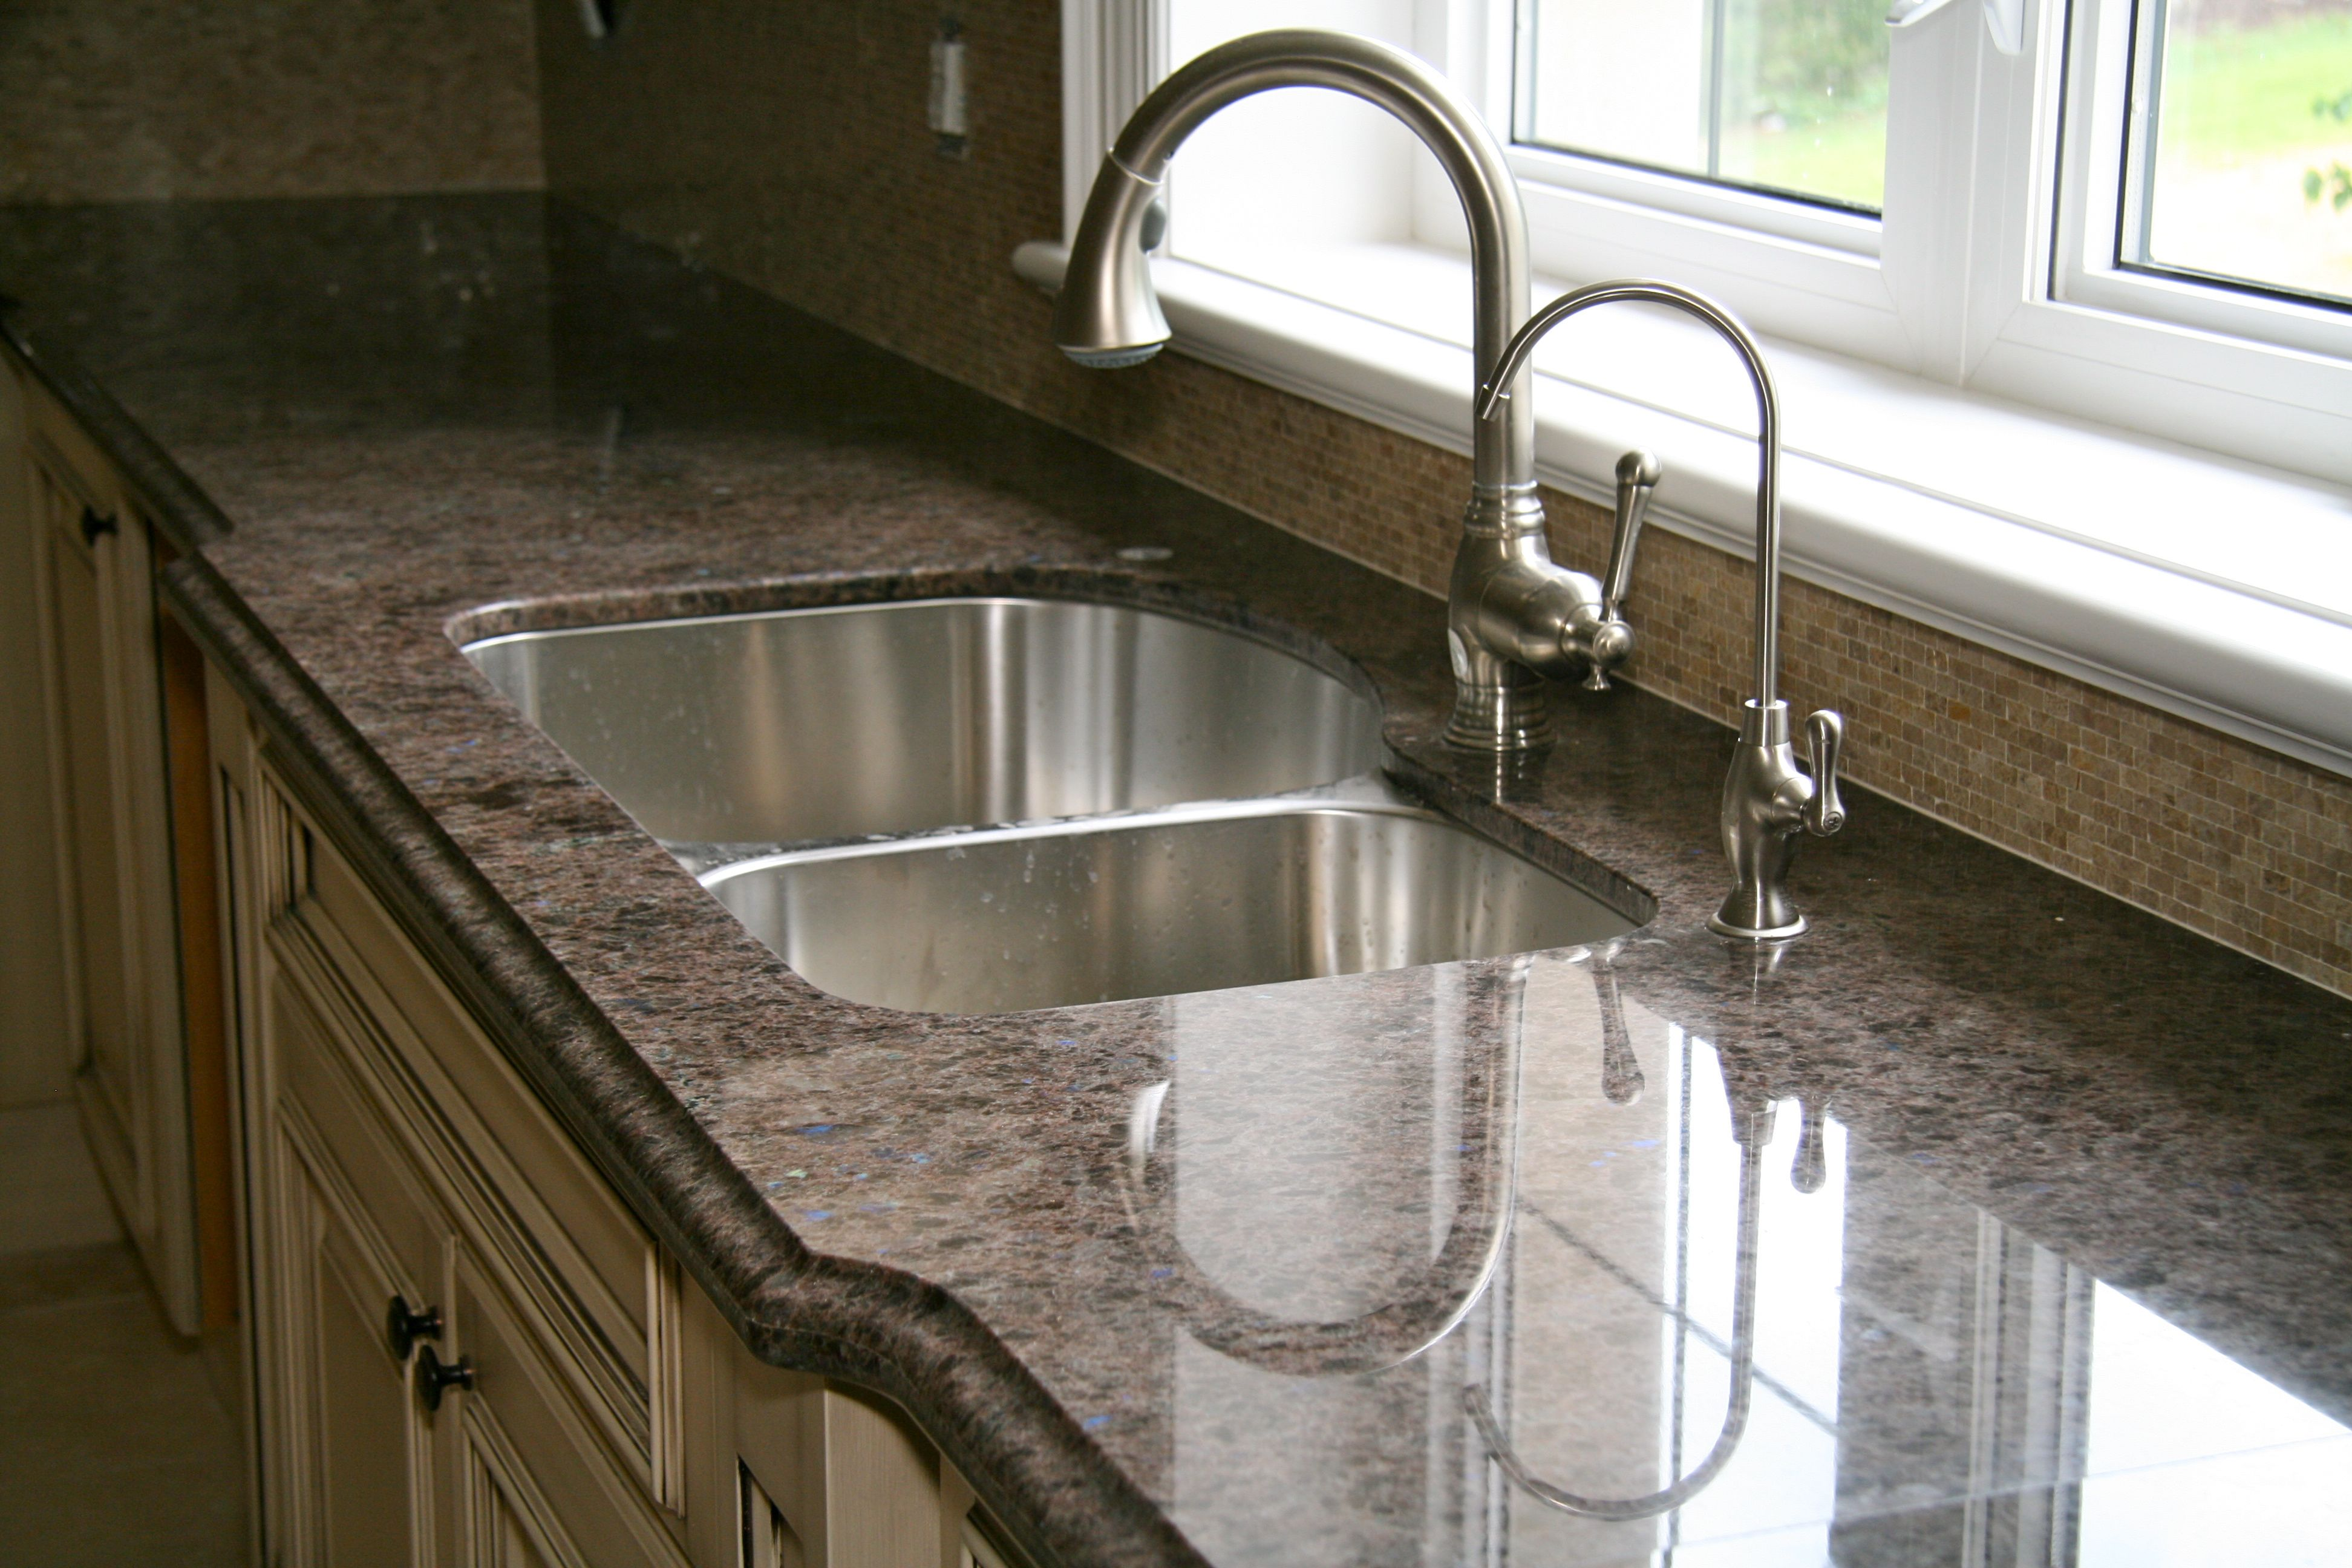 labrador antique granite www marbleandmarble com labradorantique labrador antique granite www marbleandmarble com labradorantique granite kitchen faucet